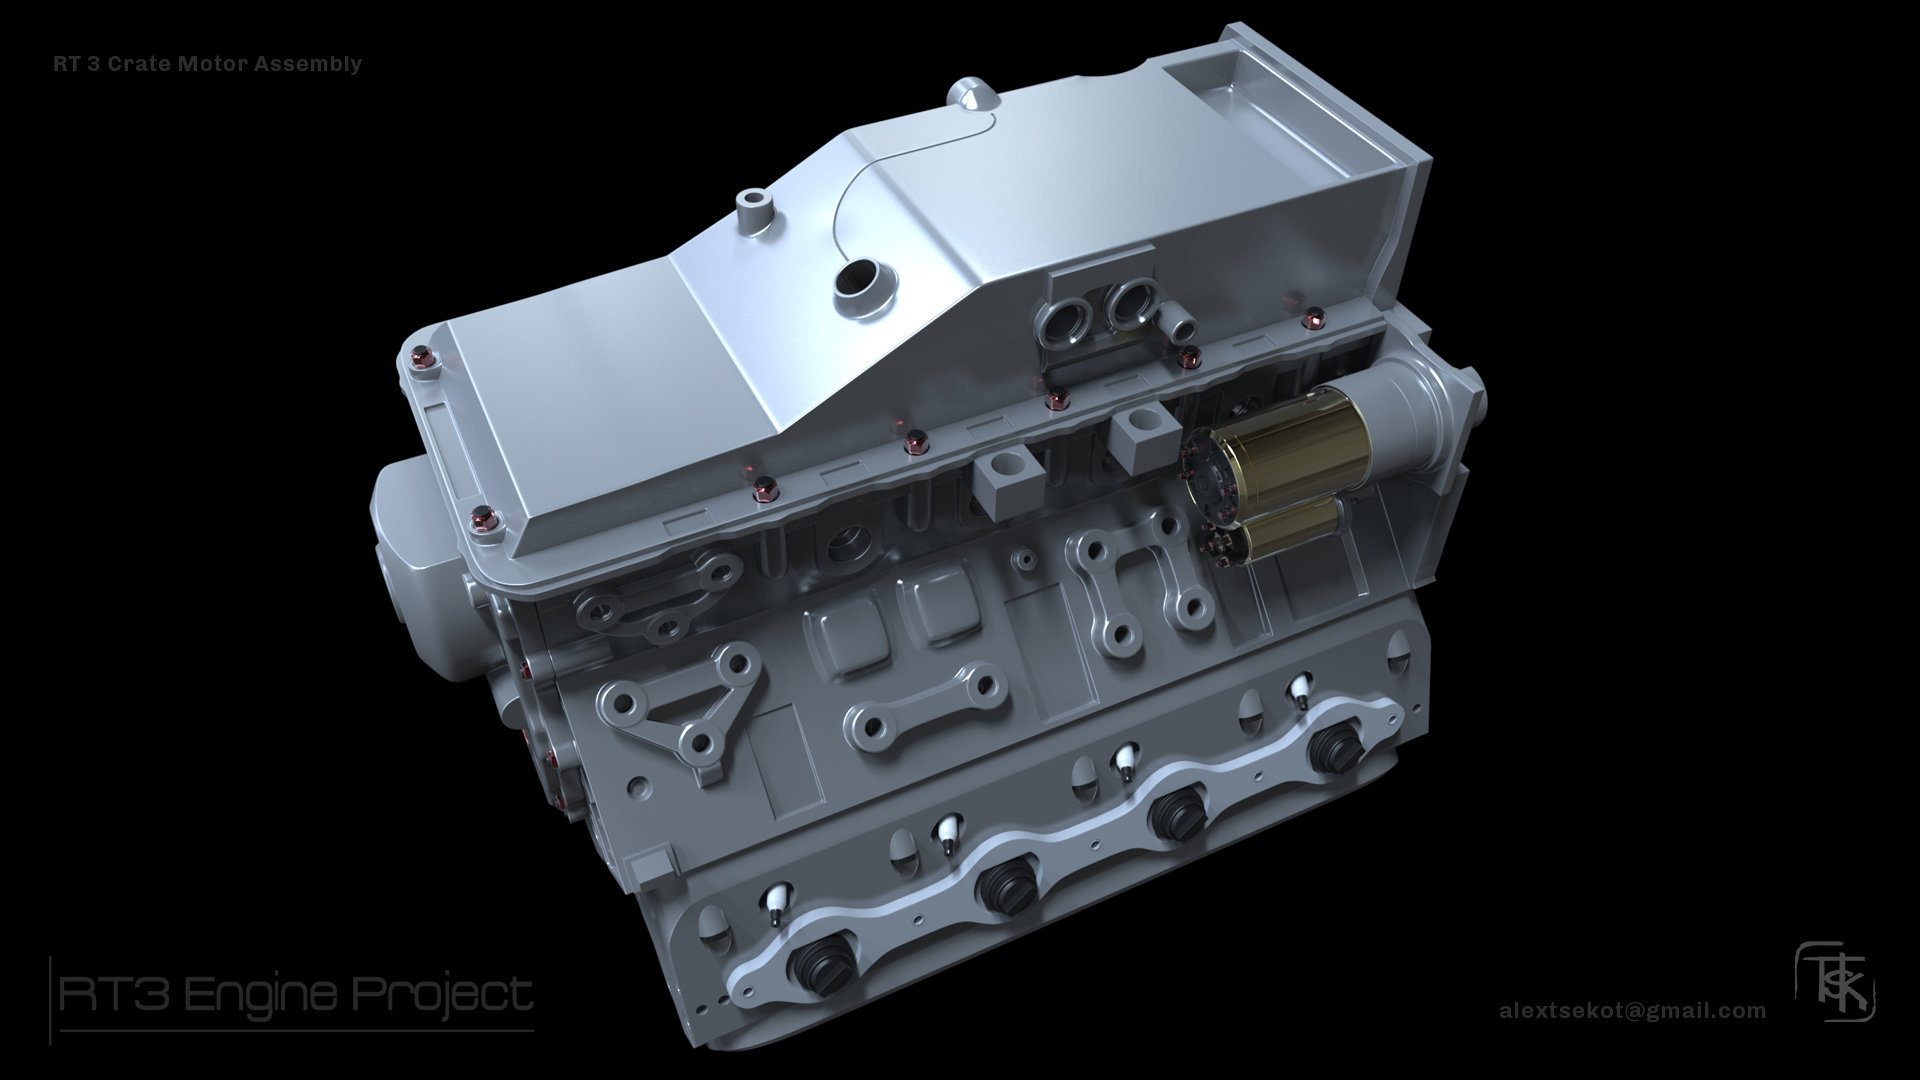 Alex tsekot engine assembly 02